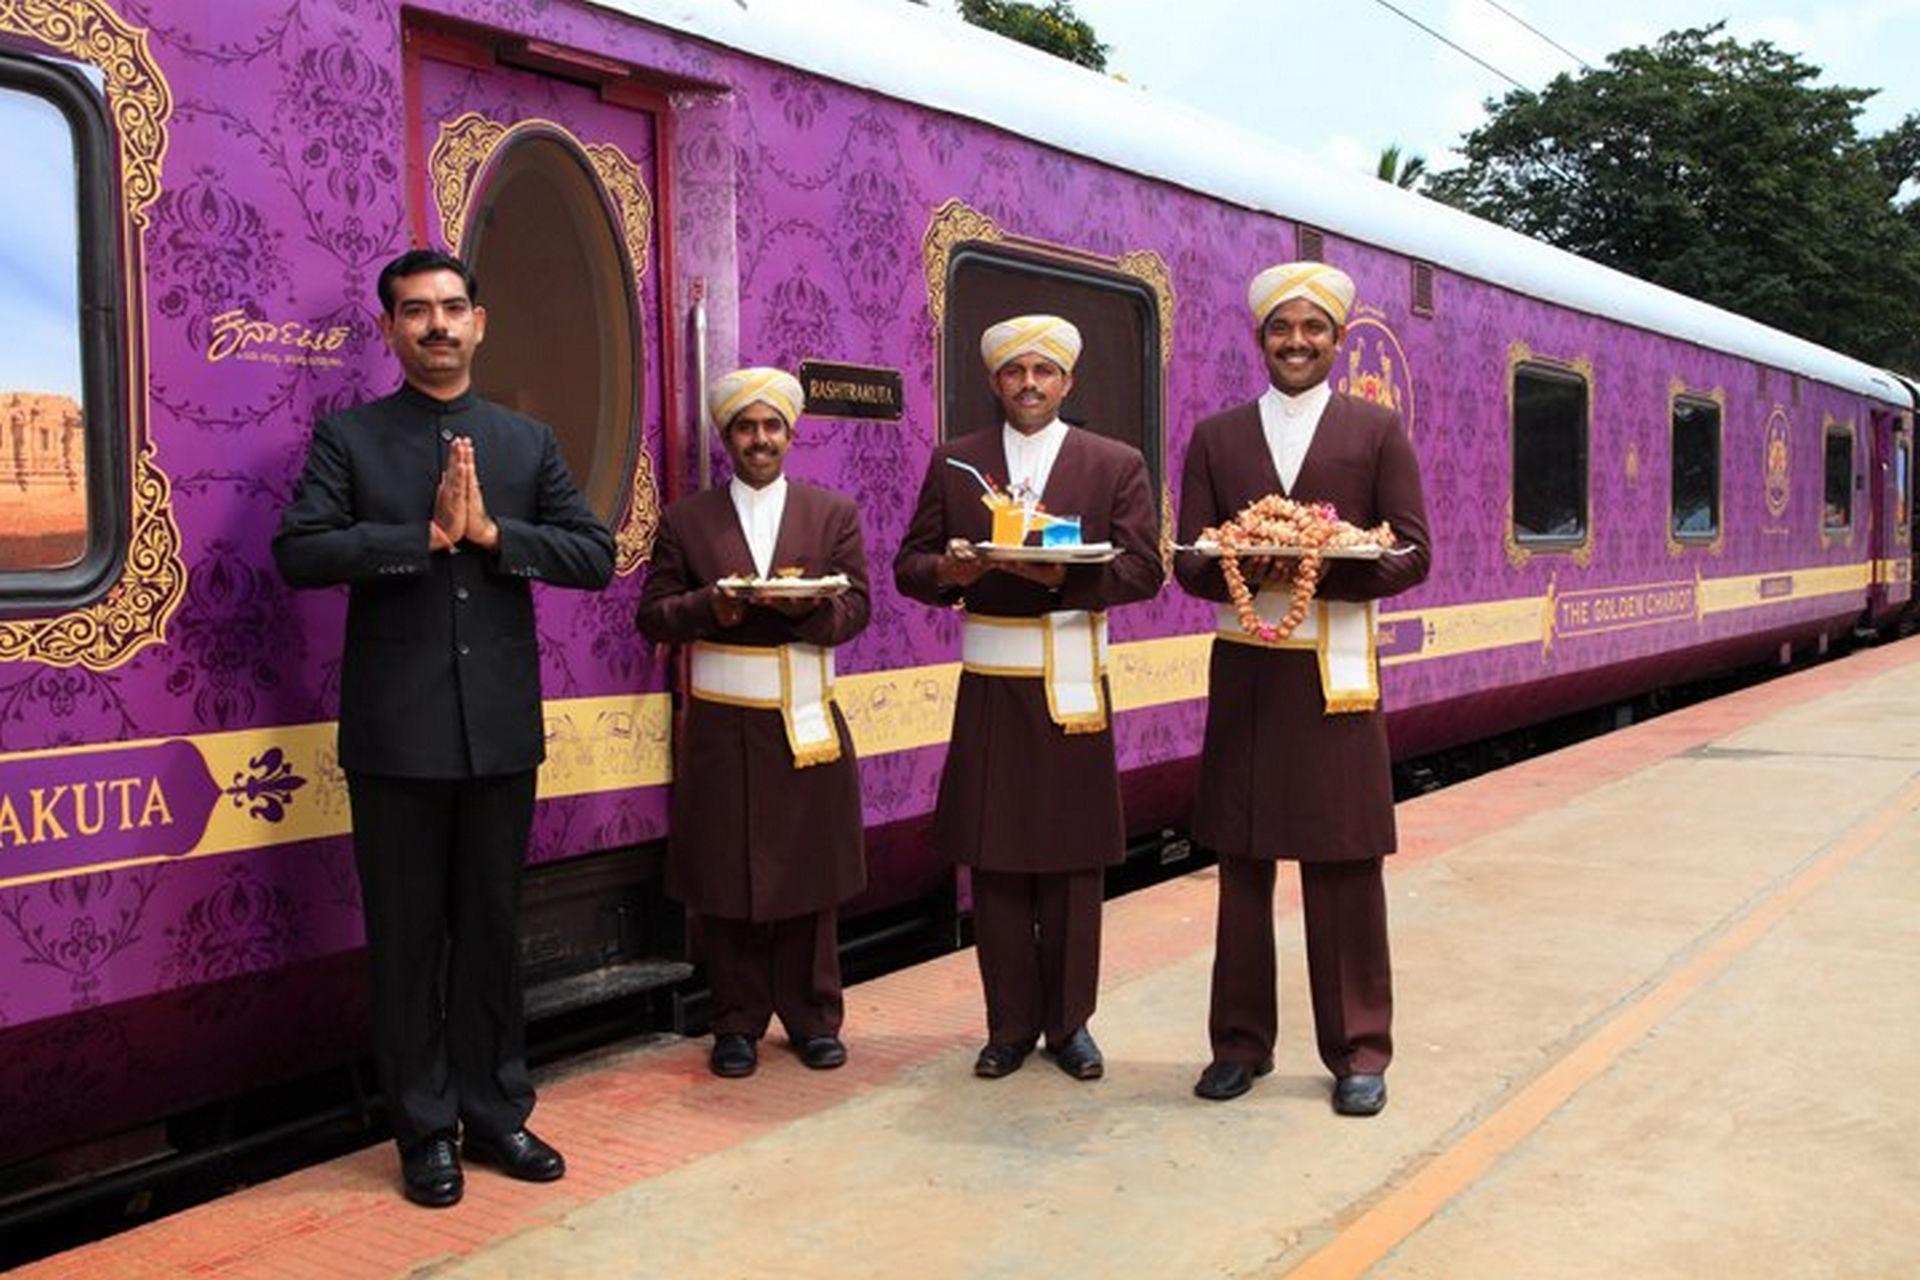 NOMAD-luksusowe-pociągi-Golden-Chariot-Indie-02